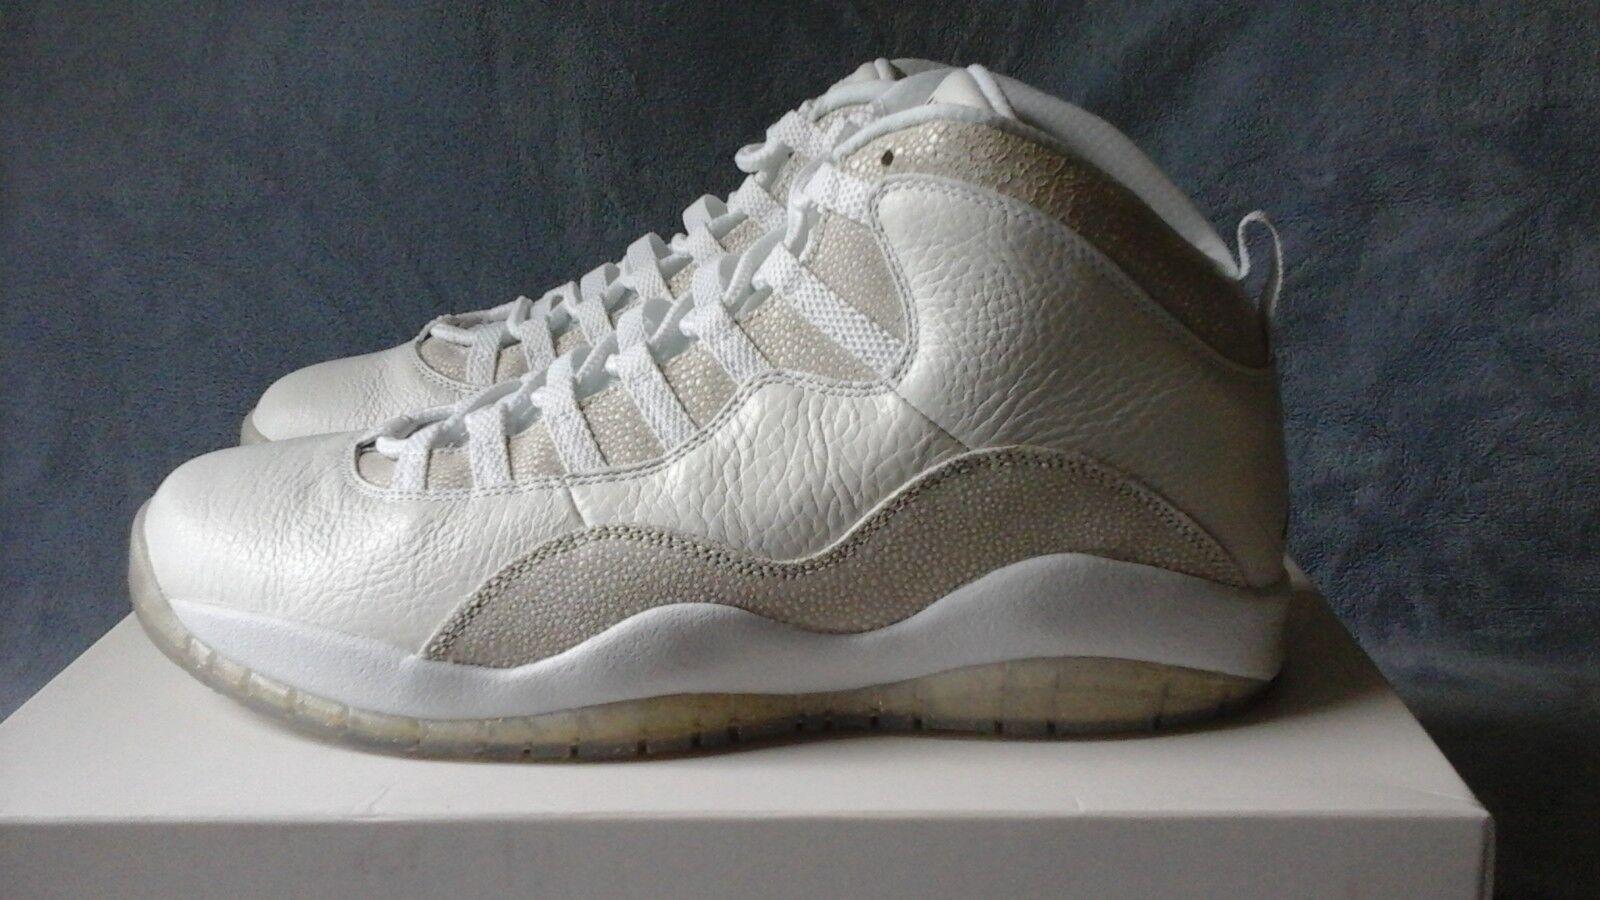 Nike Air Jordan 10 X Retro OVO Drake Summit White 819955-100 Size 11